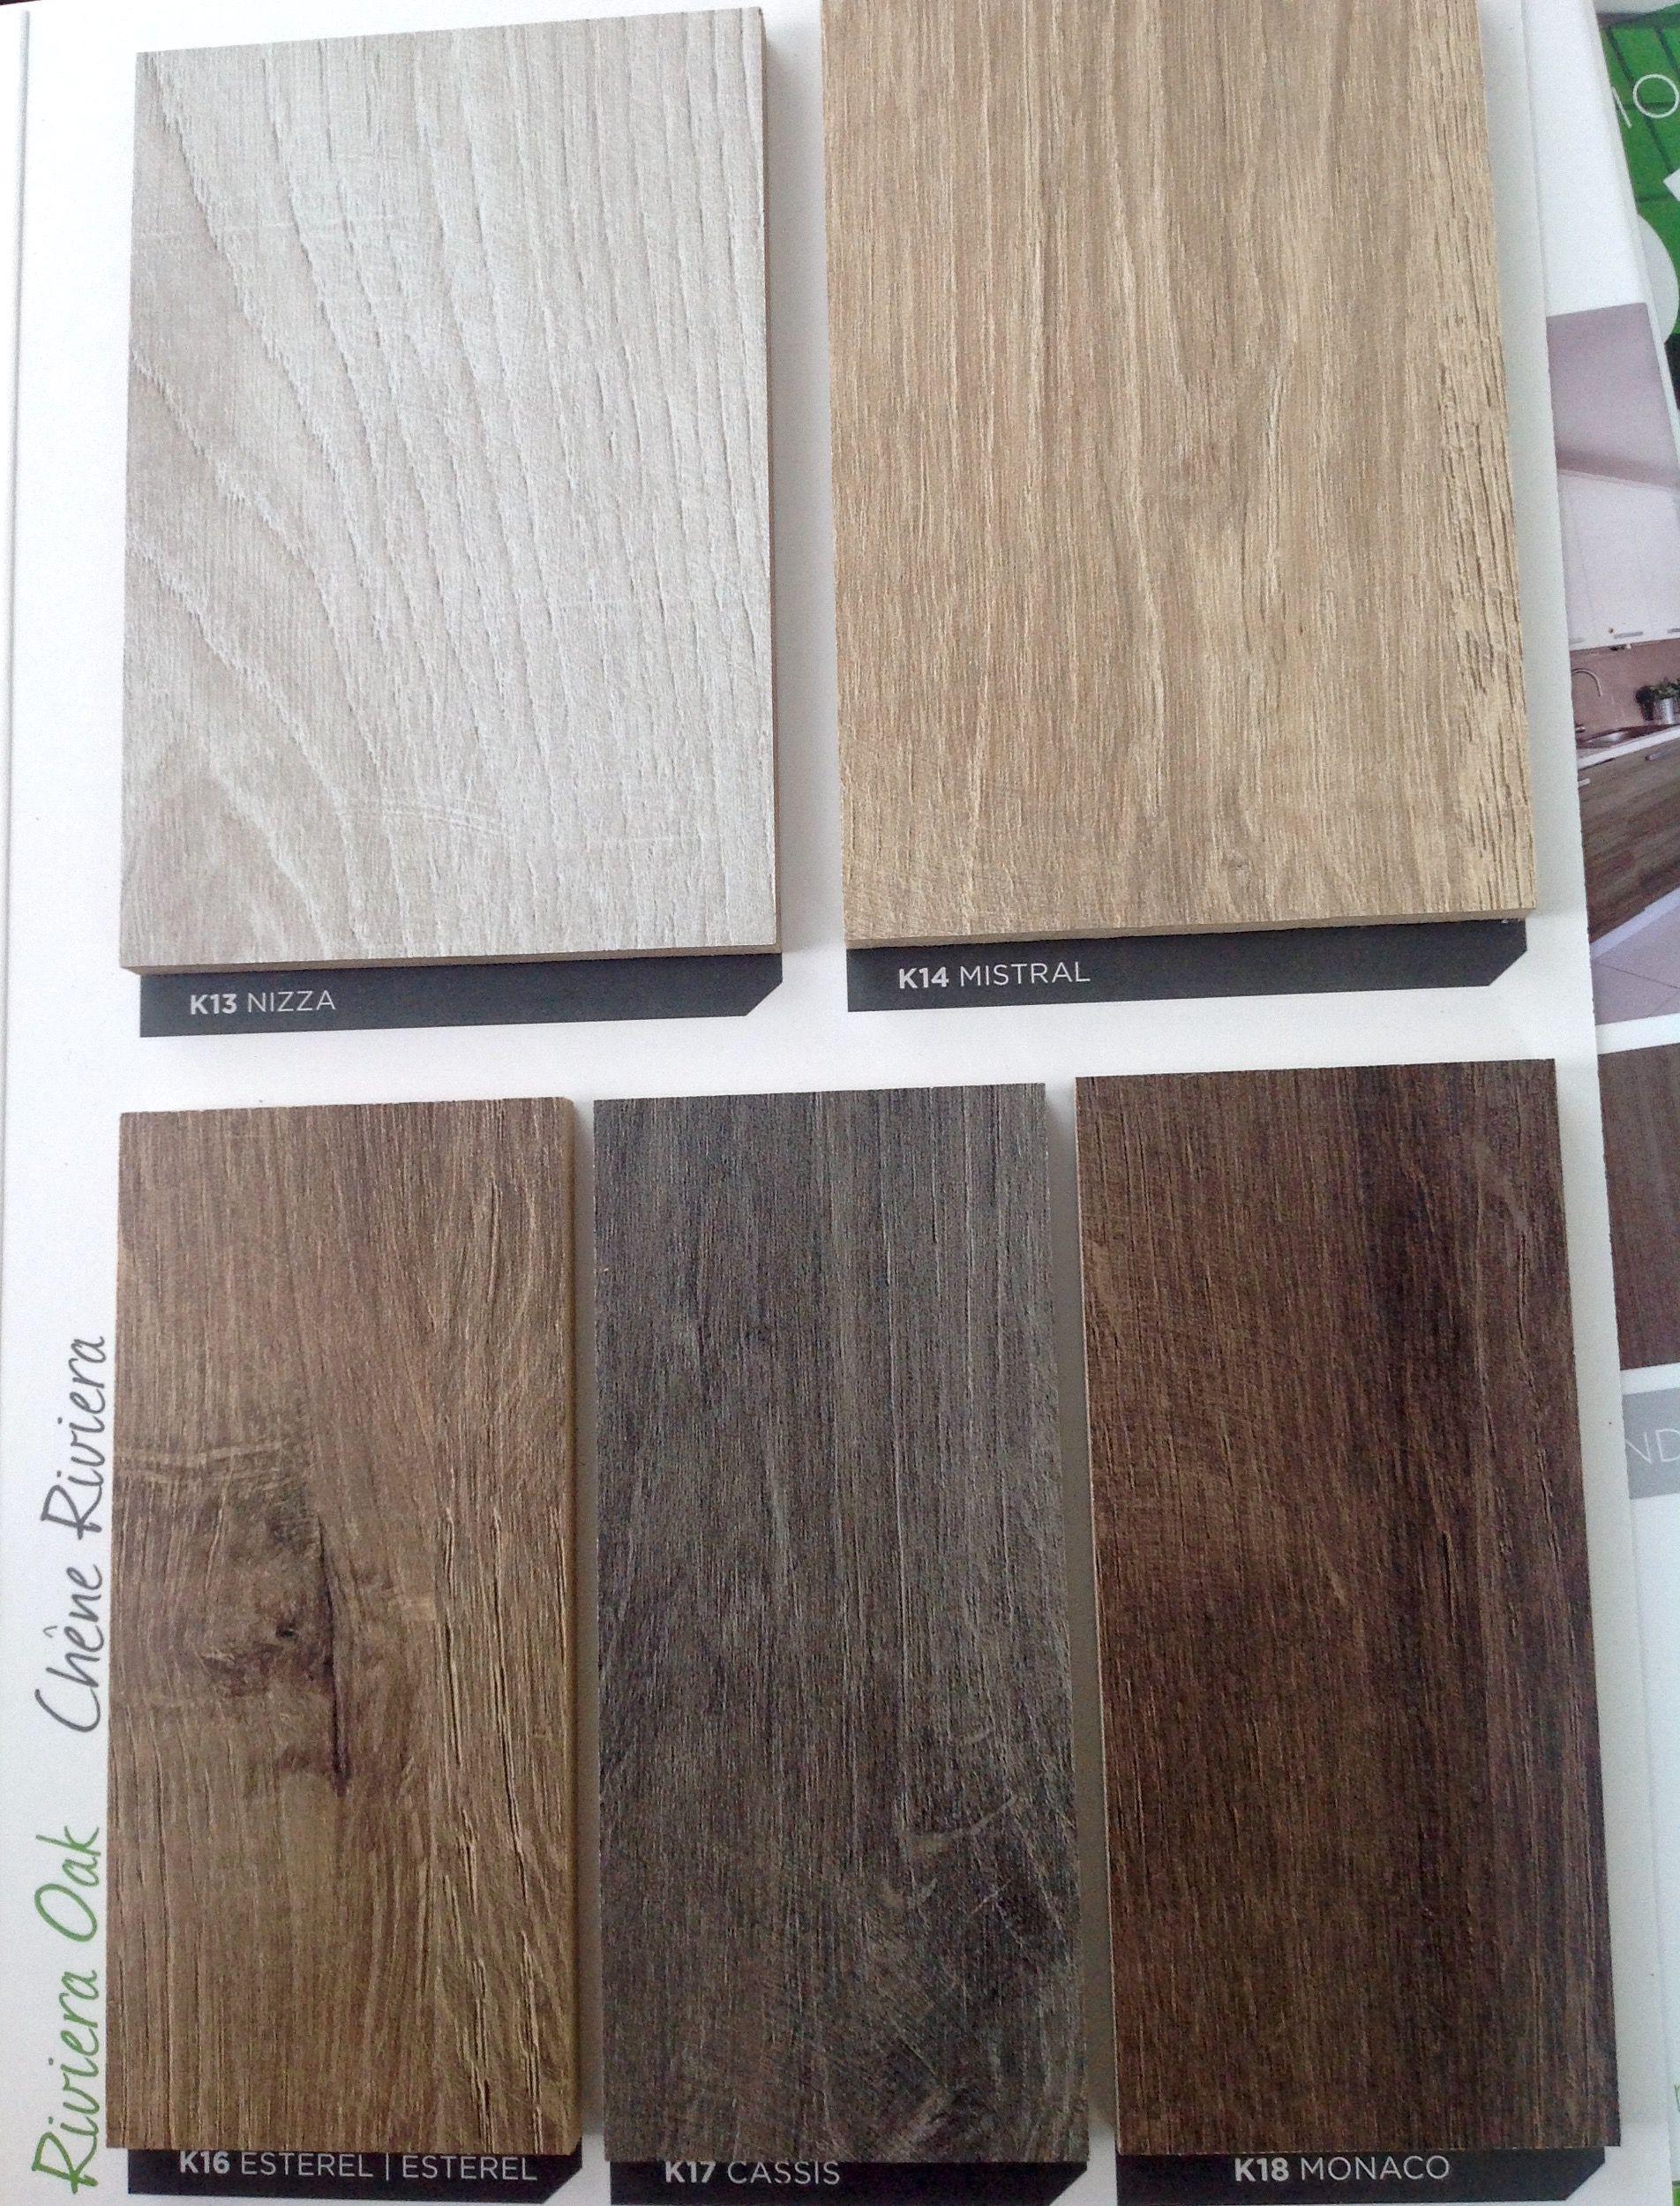 Uniboard Tflaminates Decor Panel S For Furniture Cabinets Closets Kitchens Bookcase